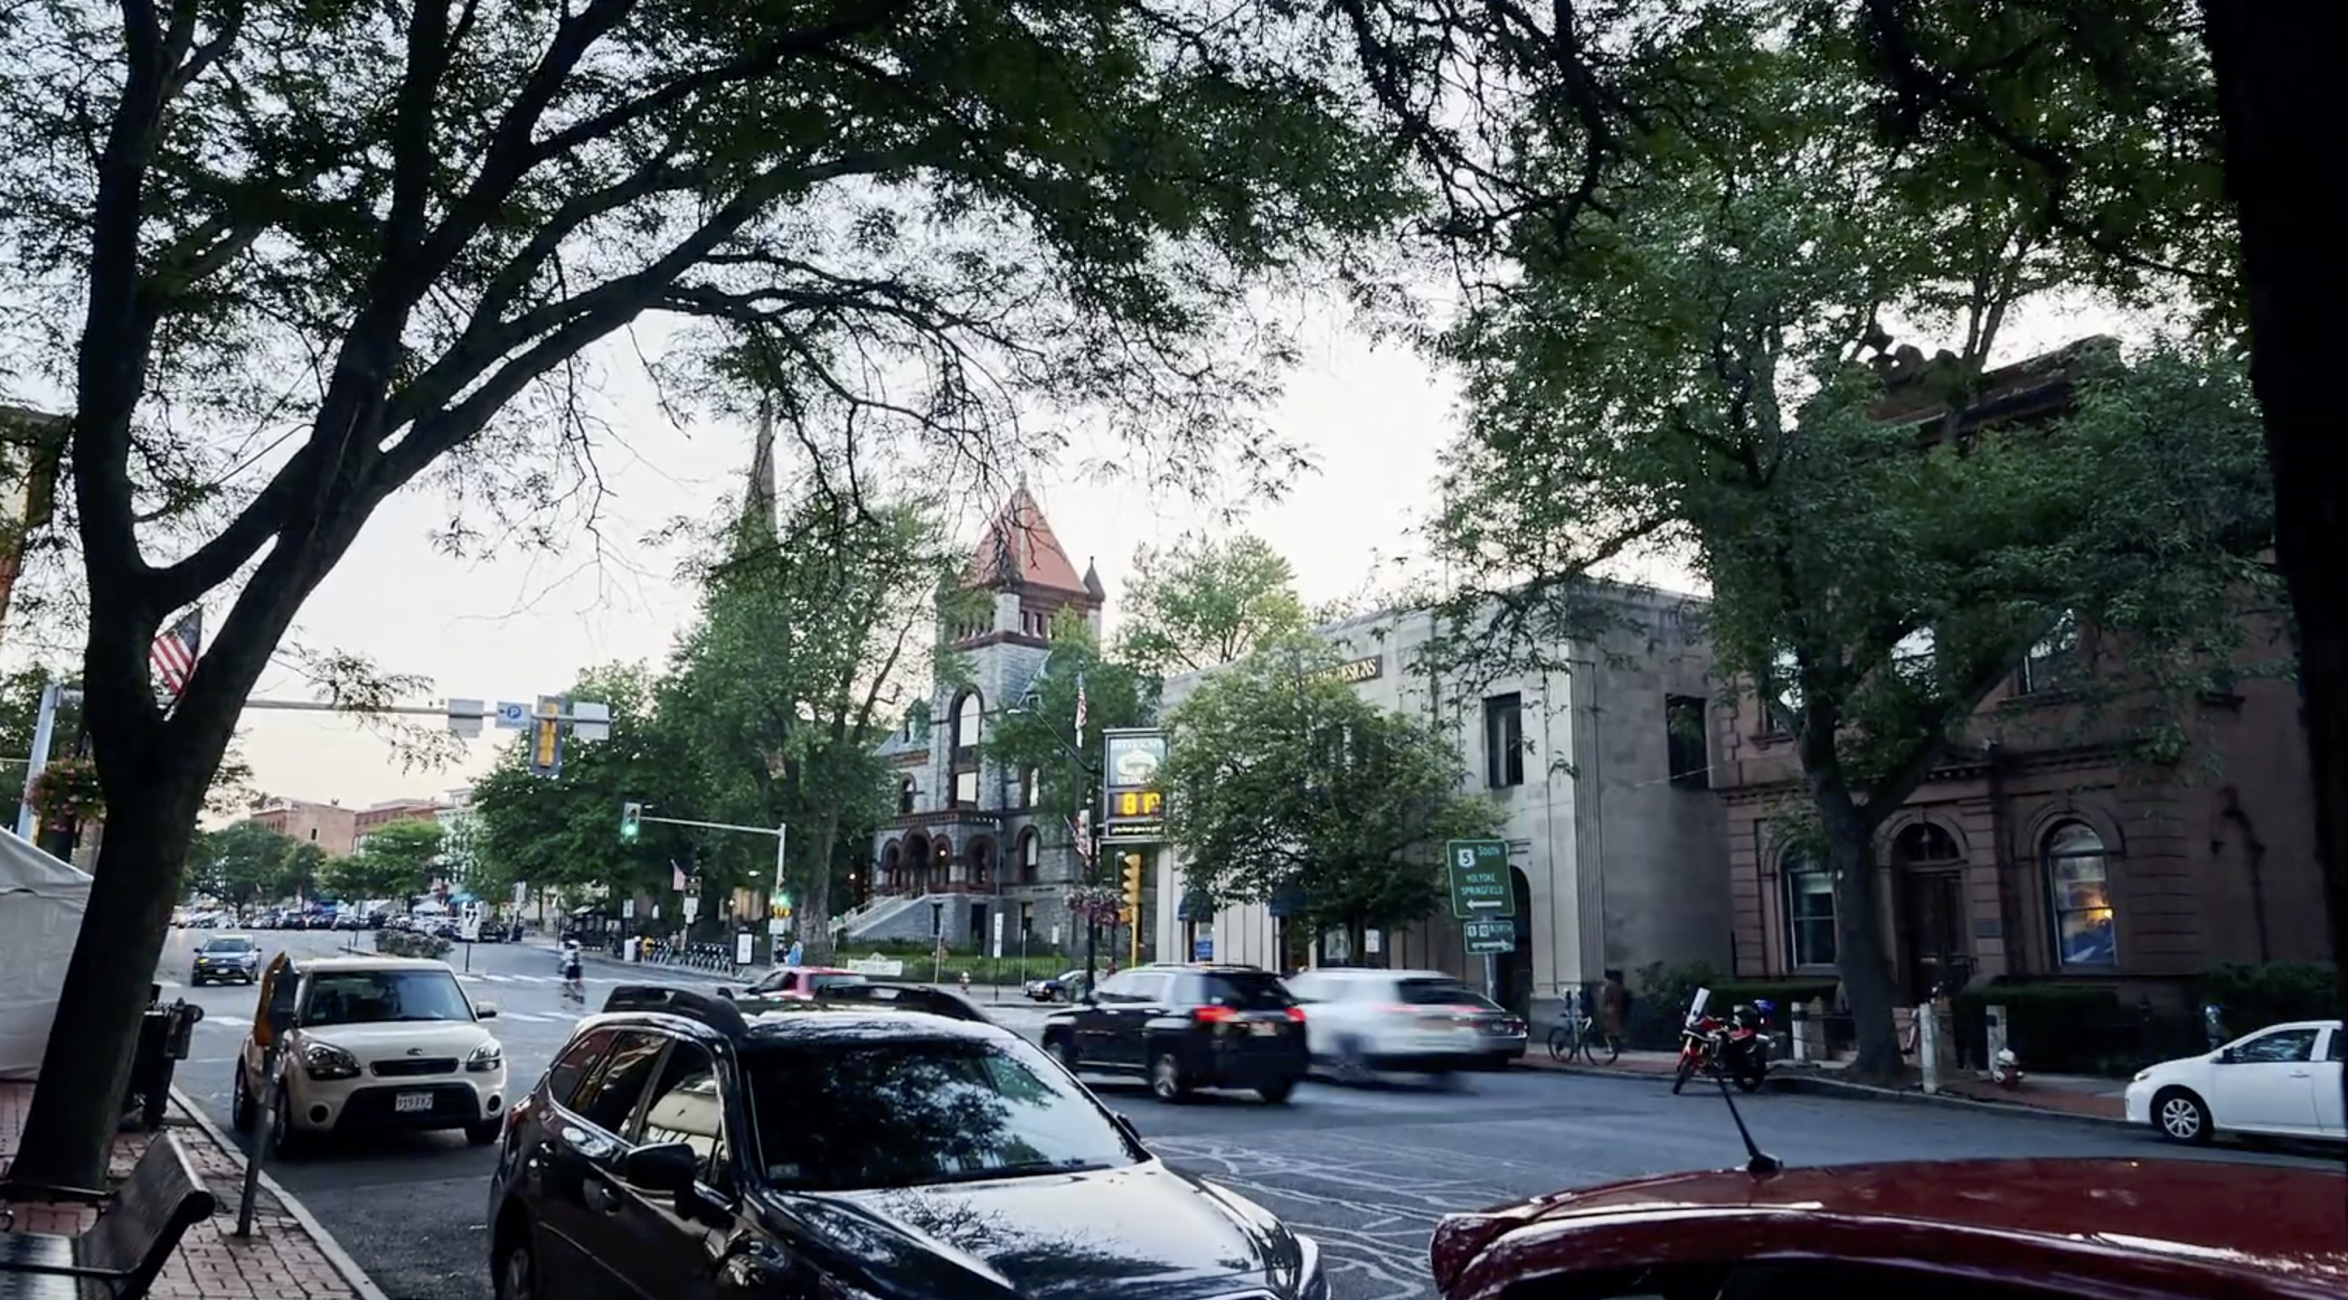 Massachusetts Downtown Northampton Timelapse